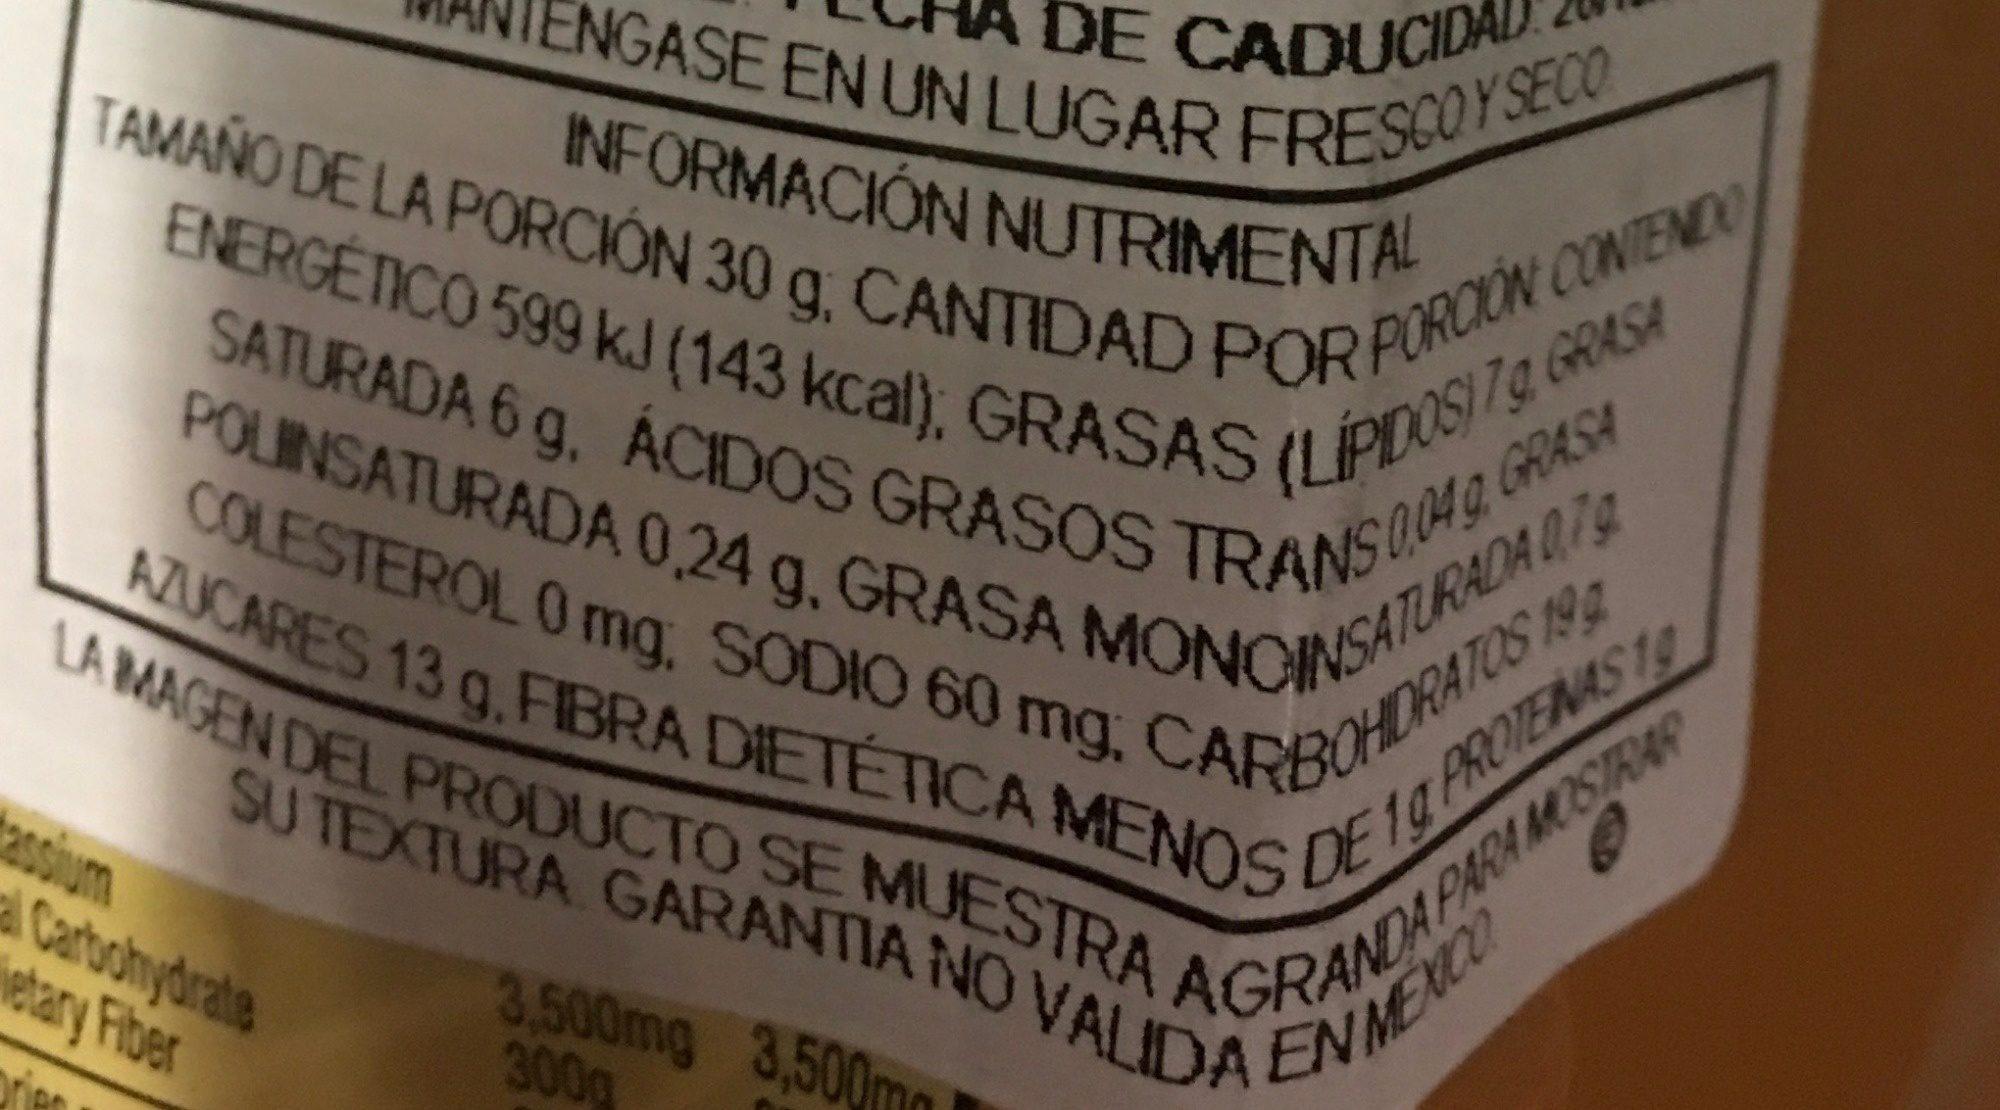 Caramel coconut & fudge cookies - Nutrition facts - es